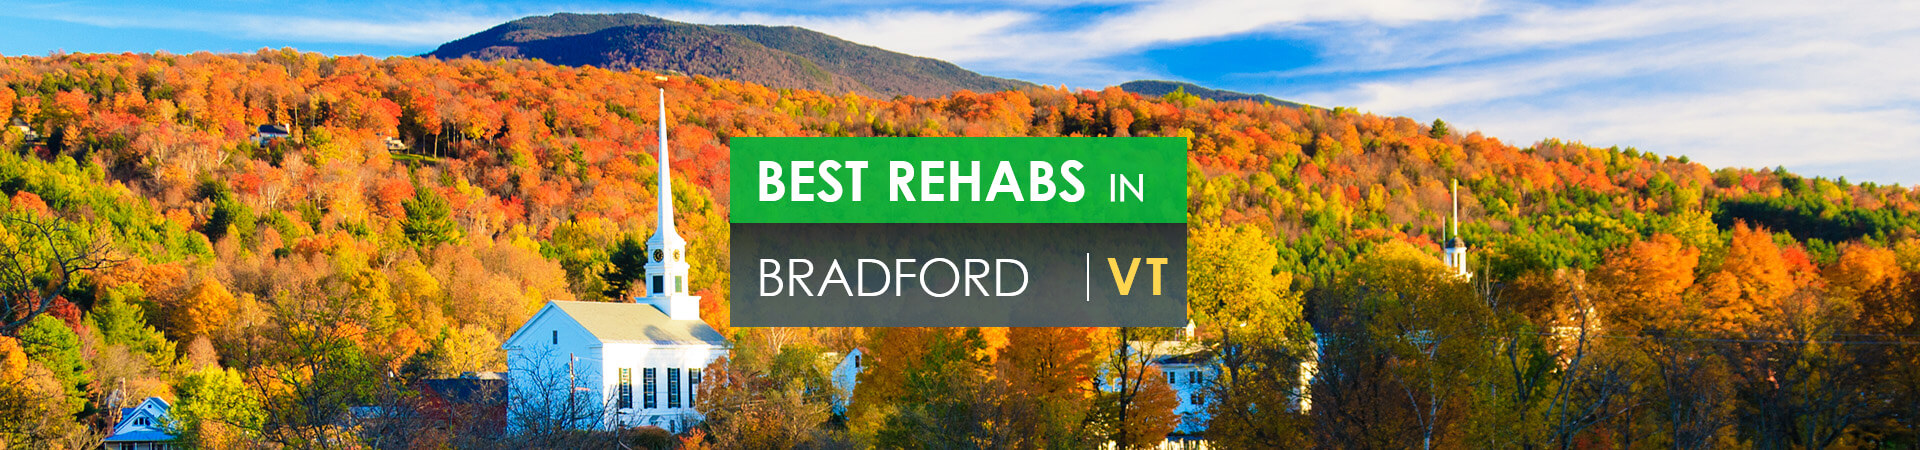 Best rehabs in Bradford, VT